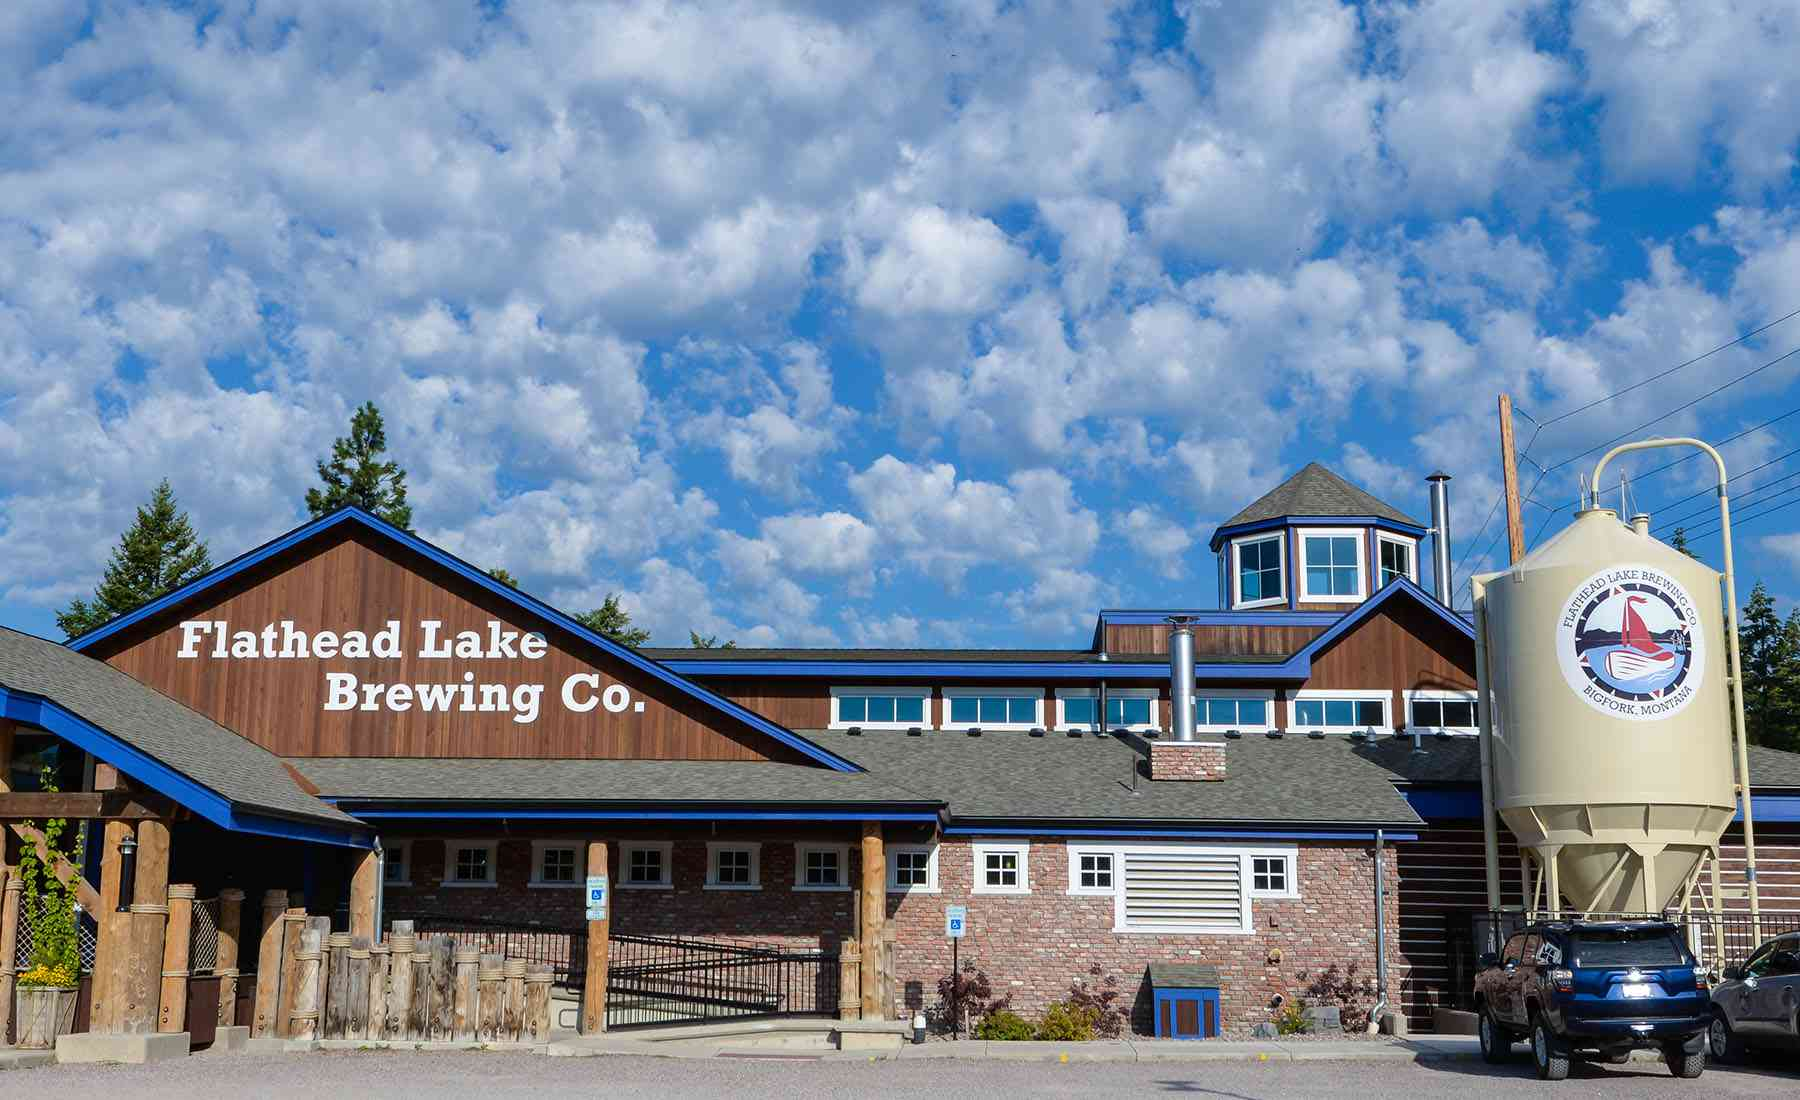 Flathead Lake Brewing Co.